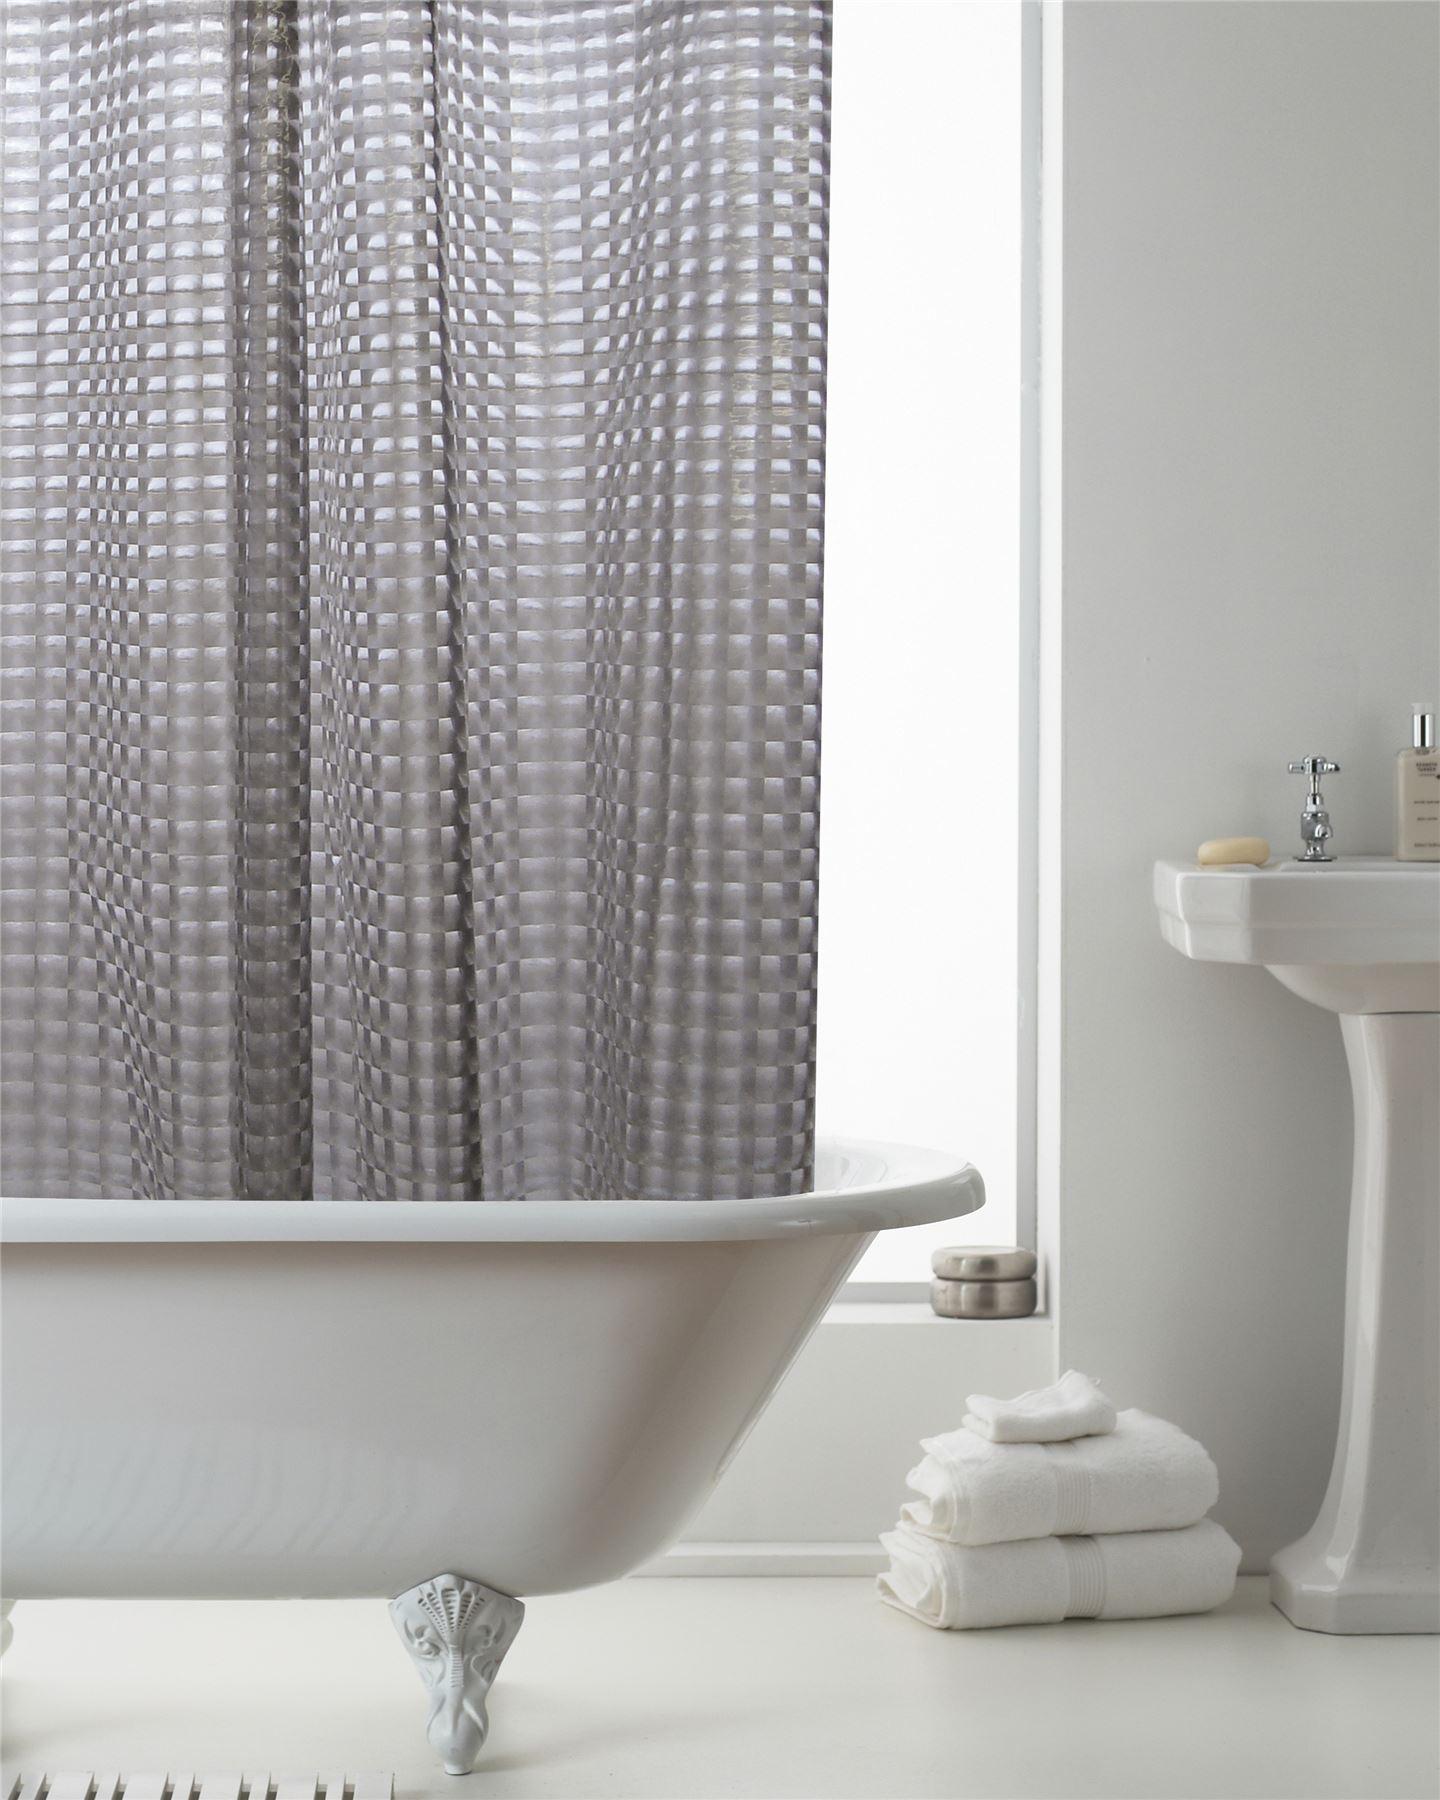 Country Club 3d Smoke Grey Shower Curtain Modern Effective Geometric